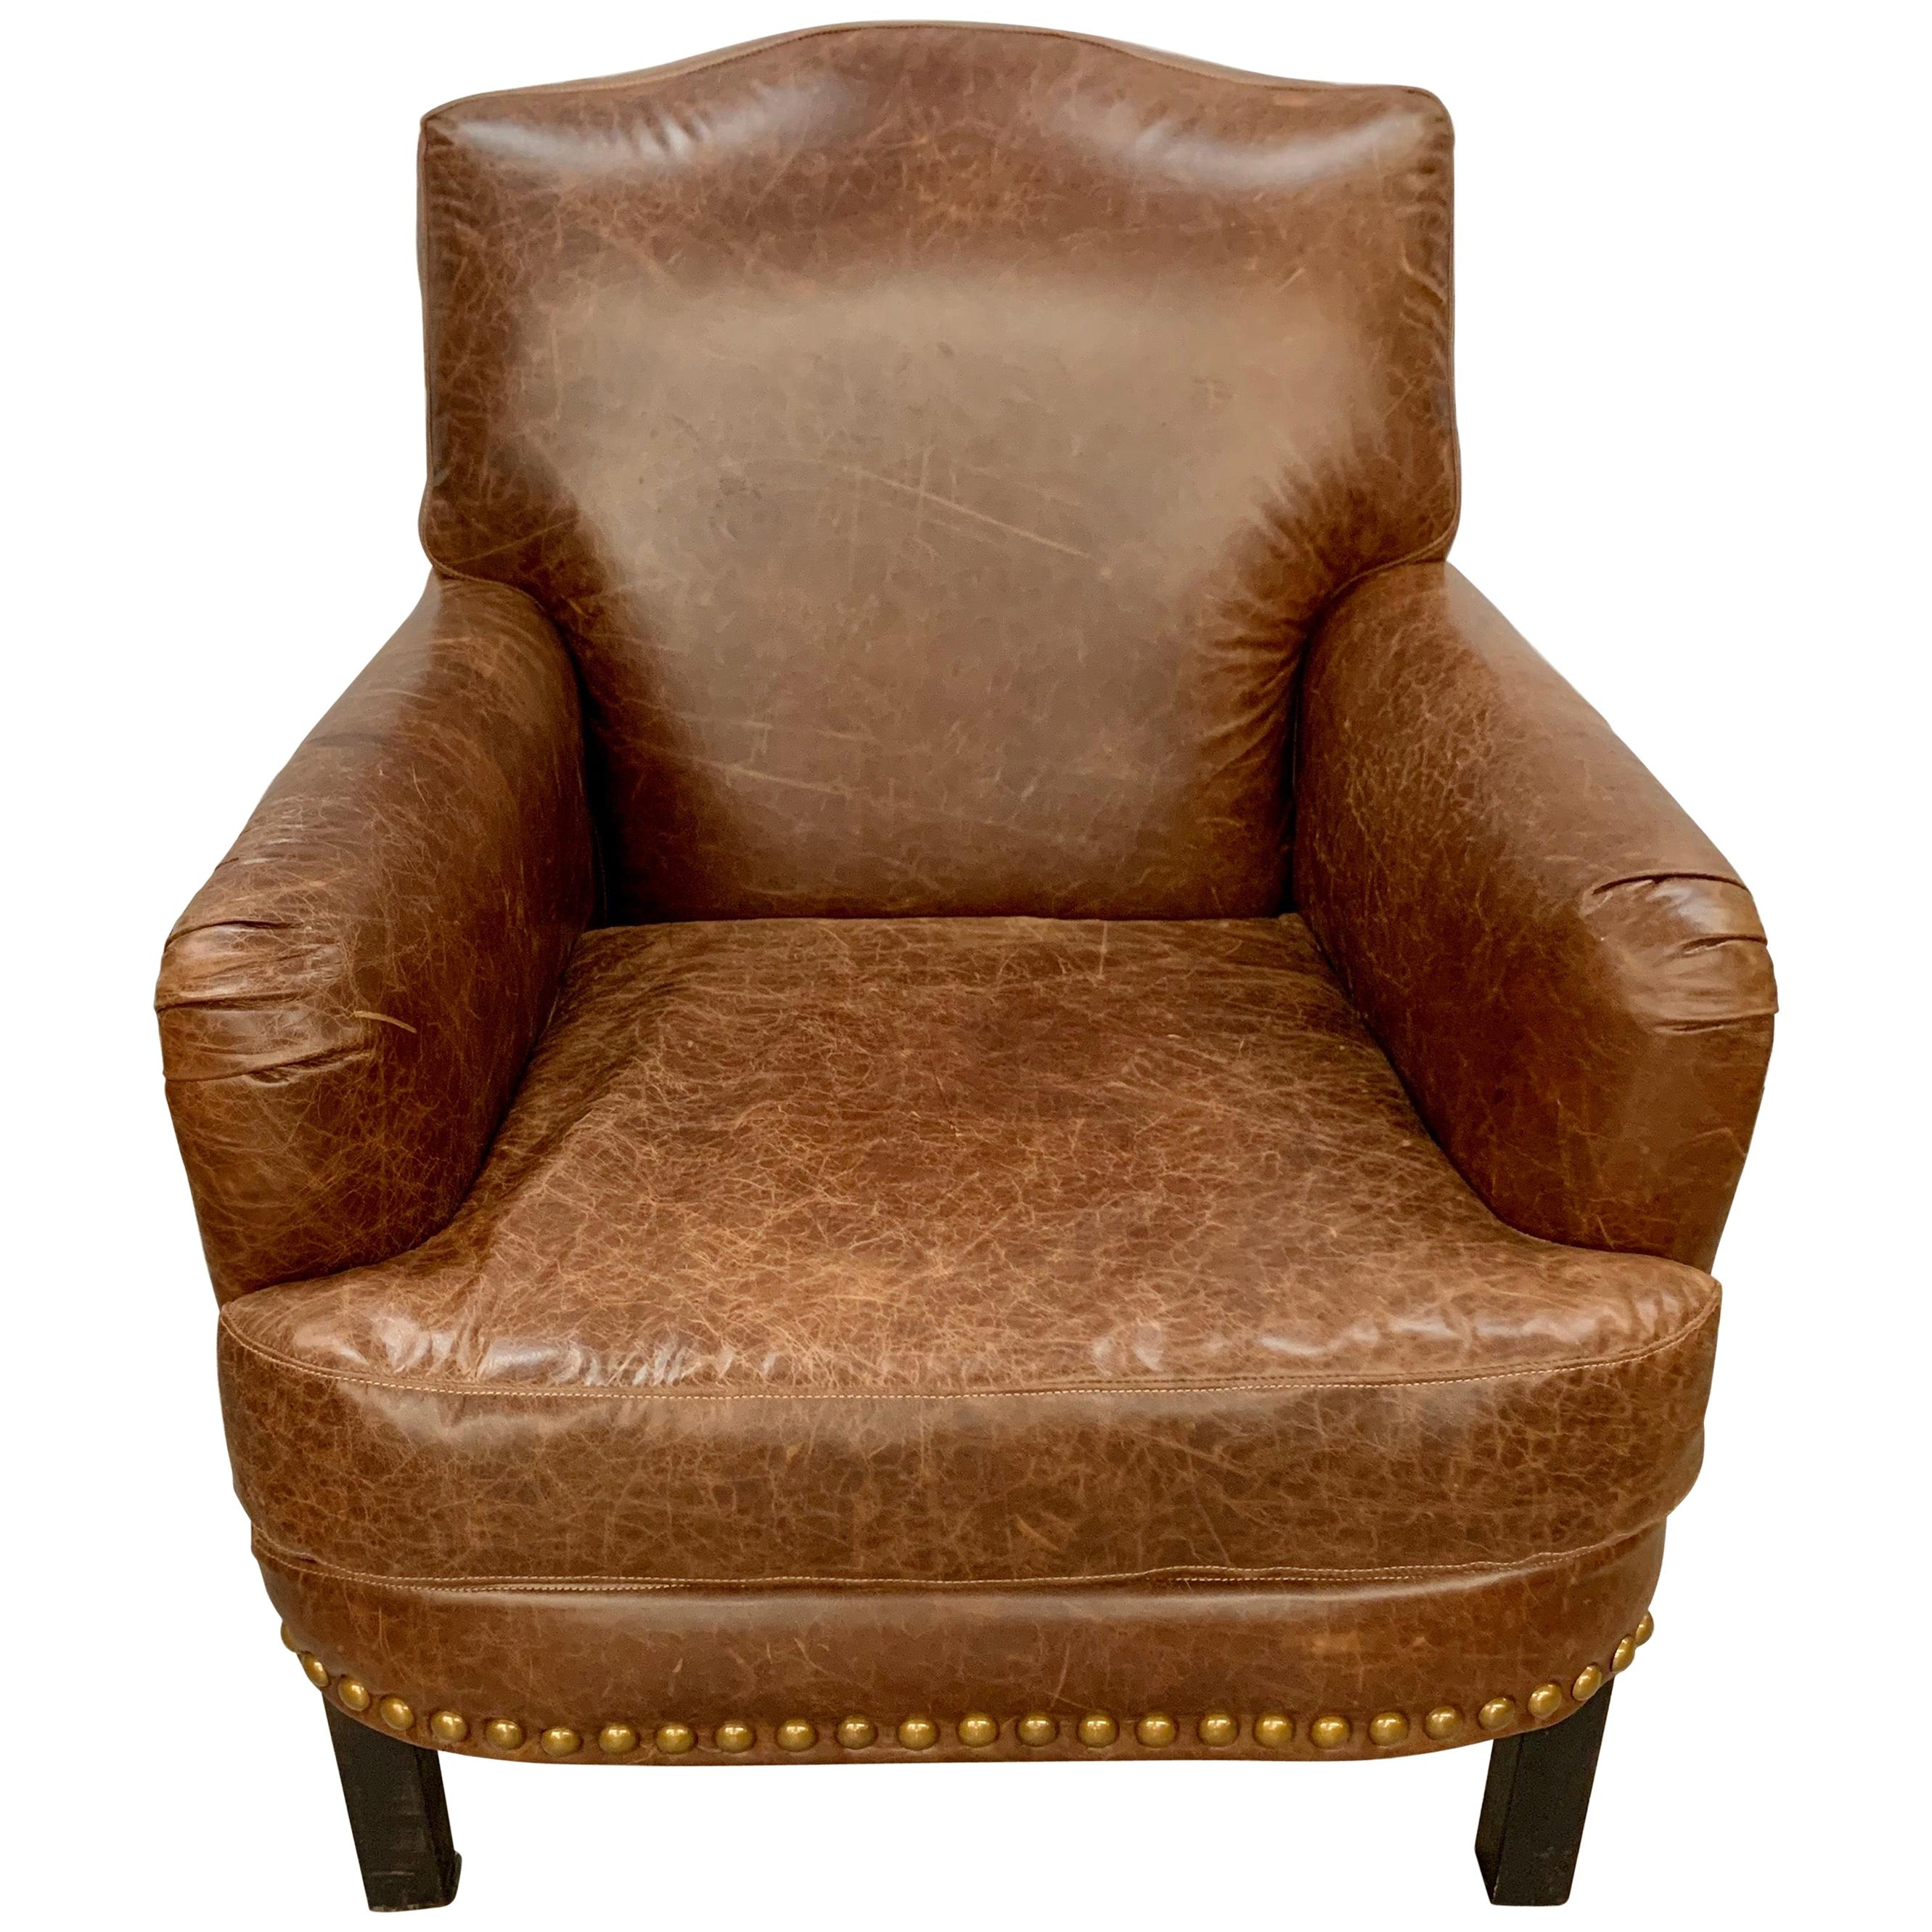 Saddle Brown Leather Nailhead Armchair Club